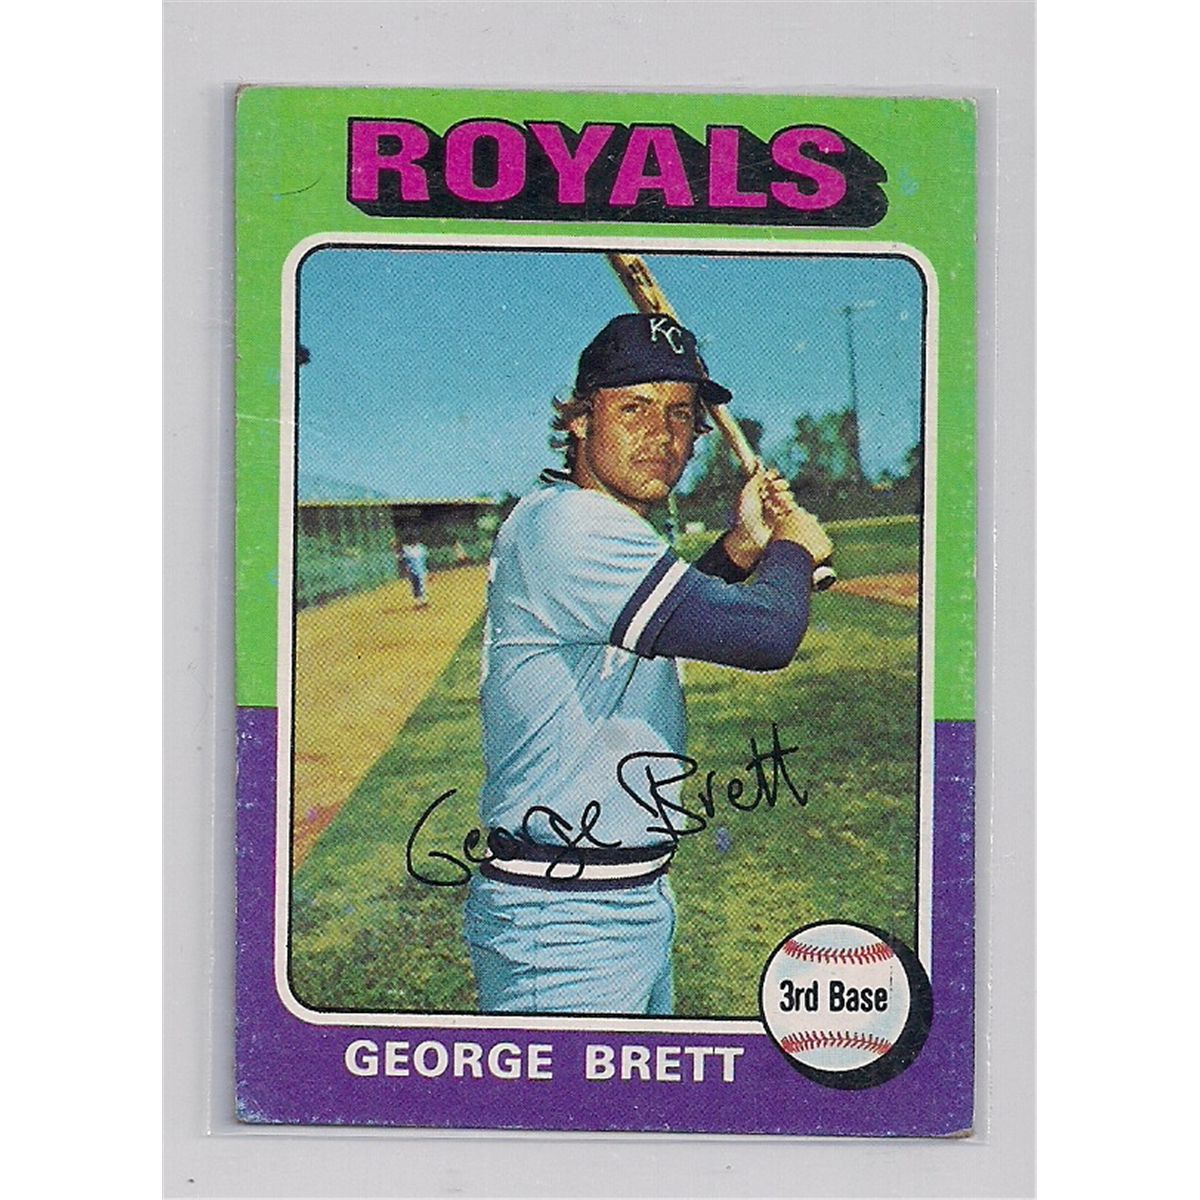 1975 Topps George Brett Rookie Card 228